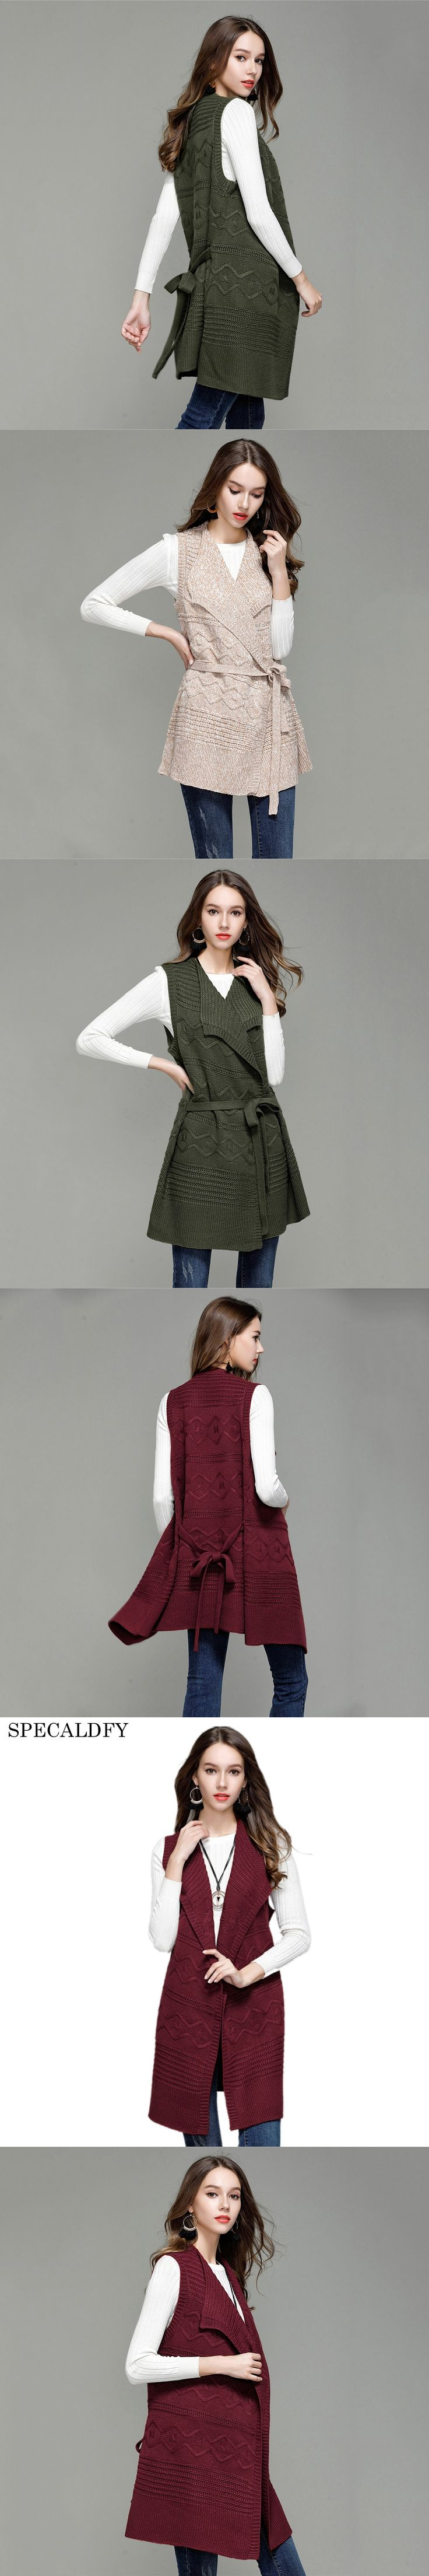 2017 Autumn Winter Long Cardigan Women Knitted Vest Coat Hooded Casual Sleeveless Jacket Female Cardigans Sweater Sashes